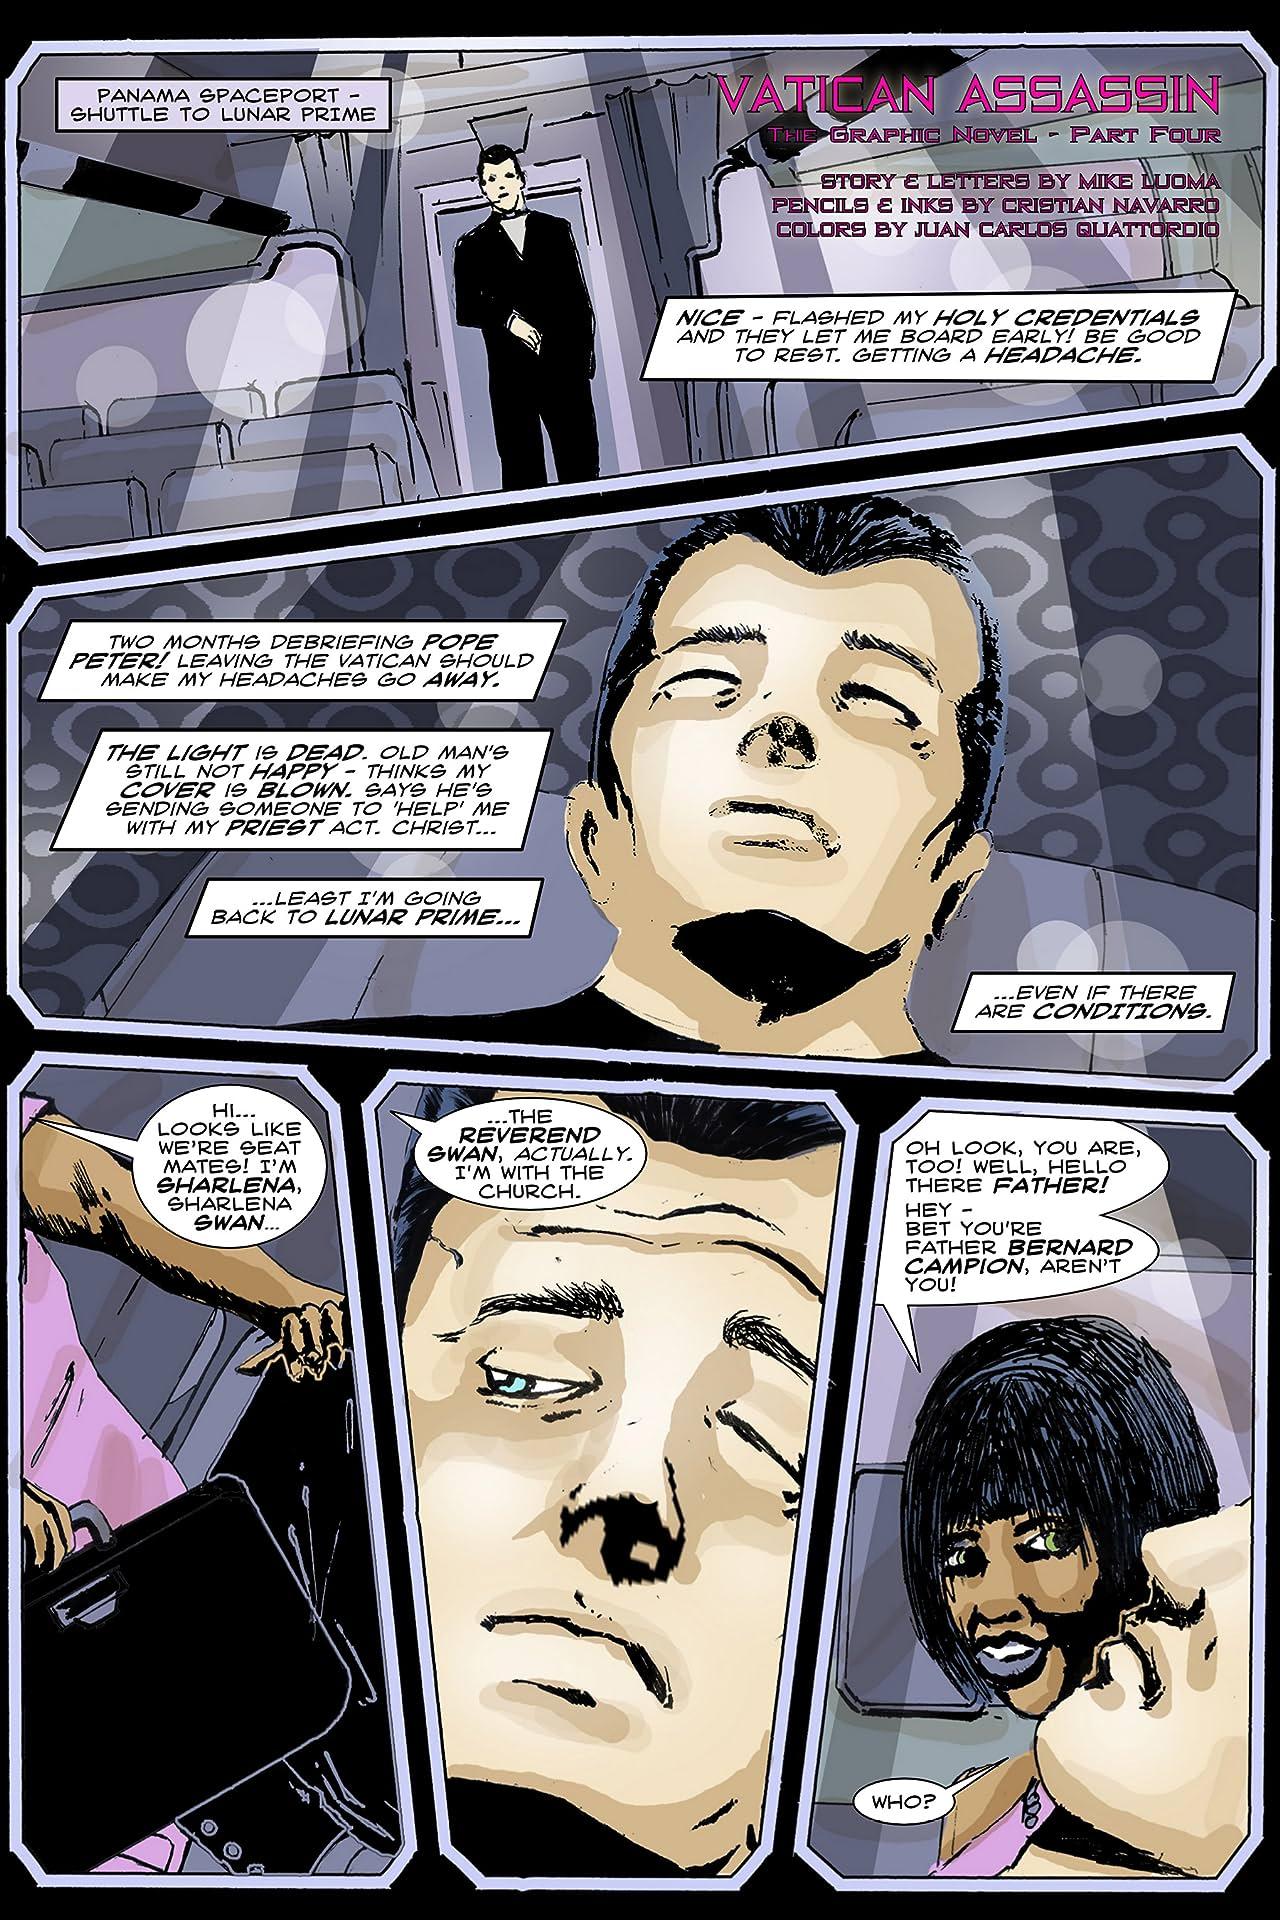 Vatican Assassin - The Graphic Novel #4